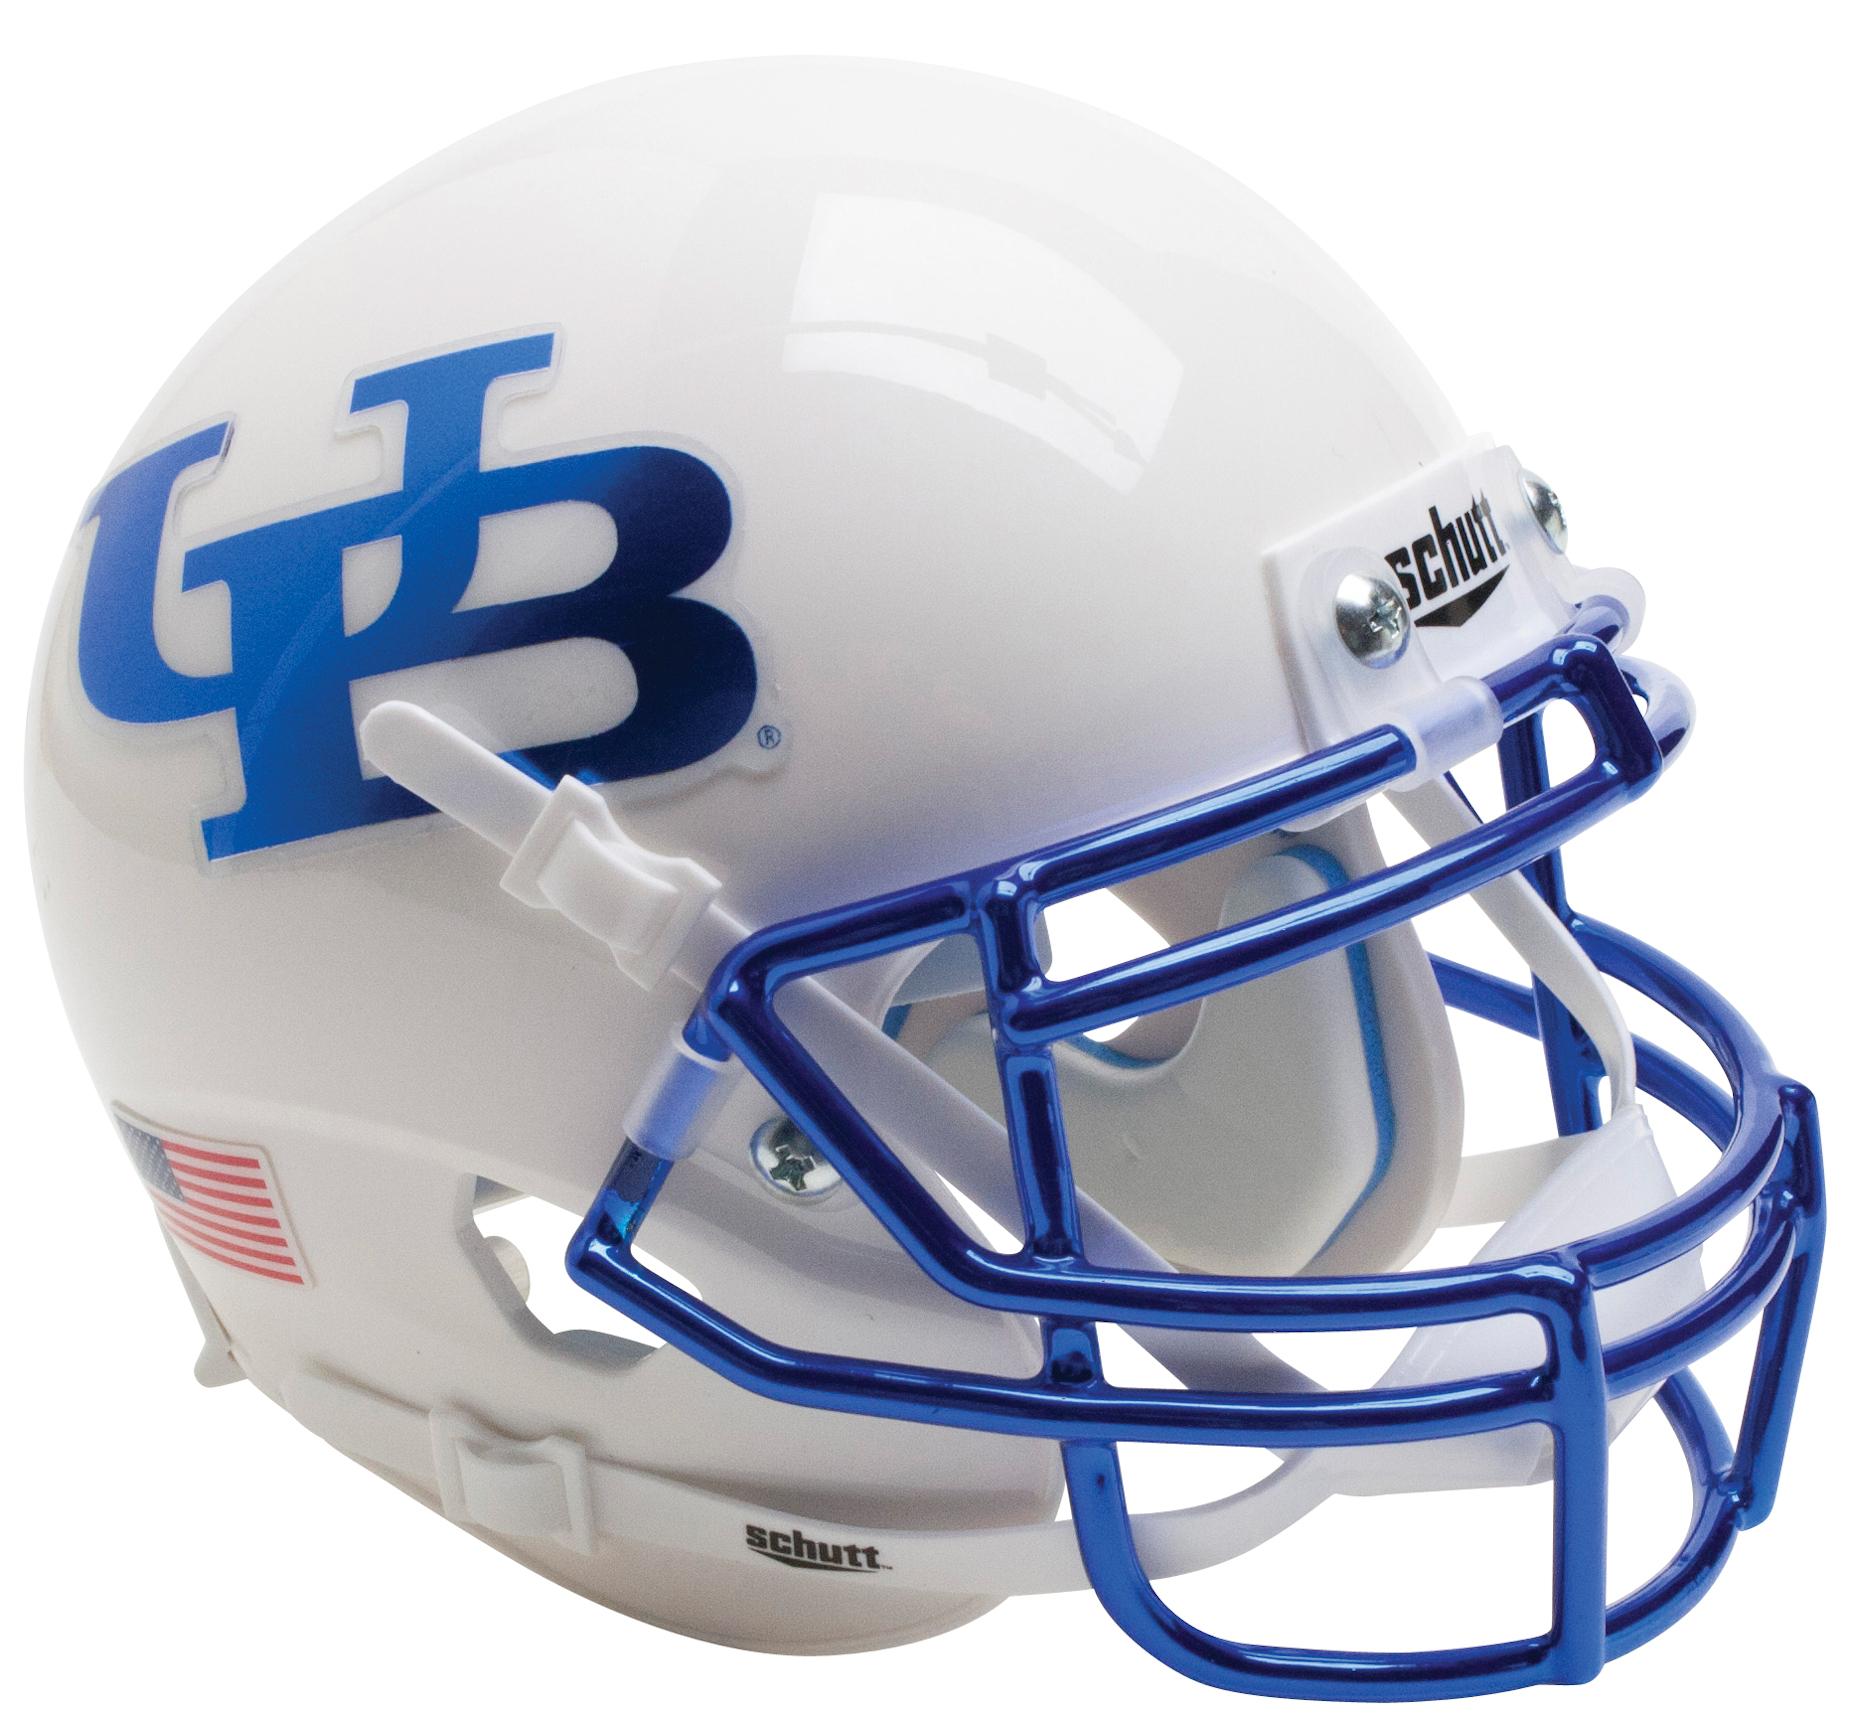 Buffalo Bulls Authentic College XP Football Helmet Schutt <B>White Blue Mask</B>